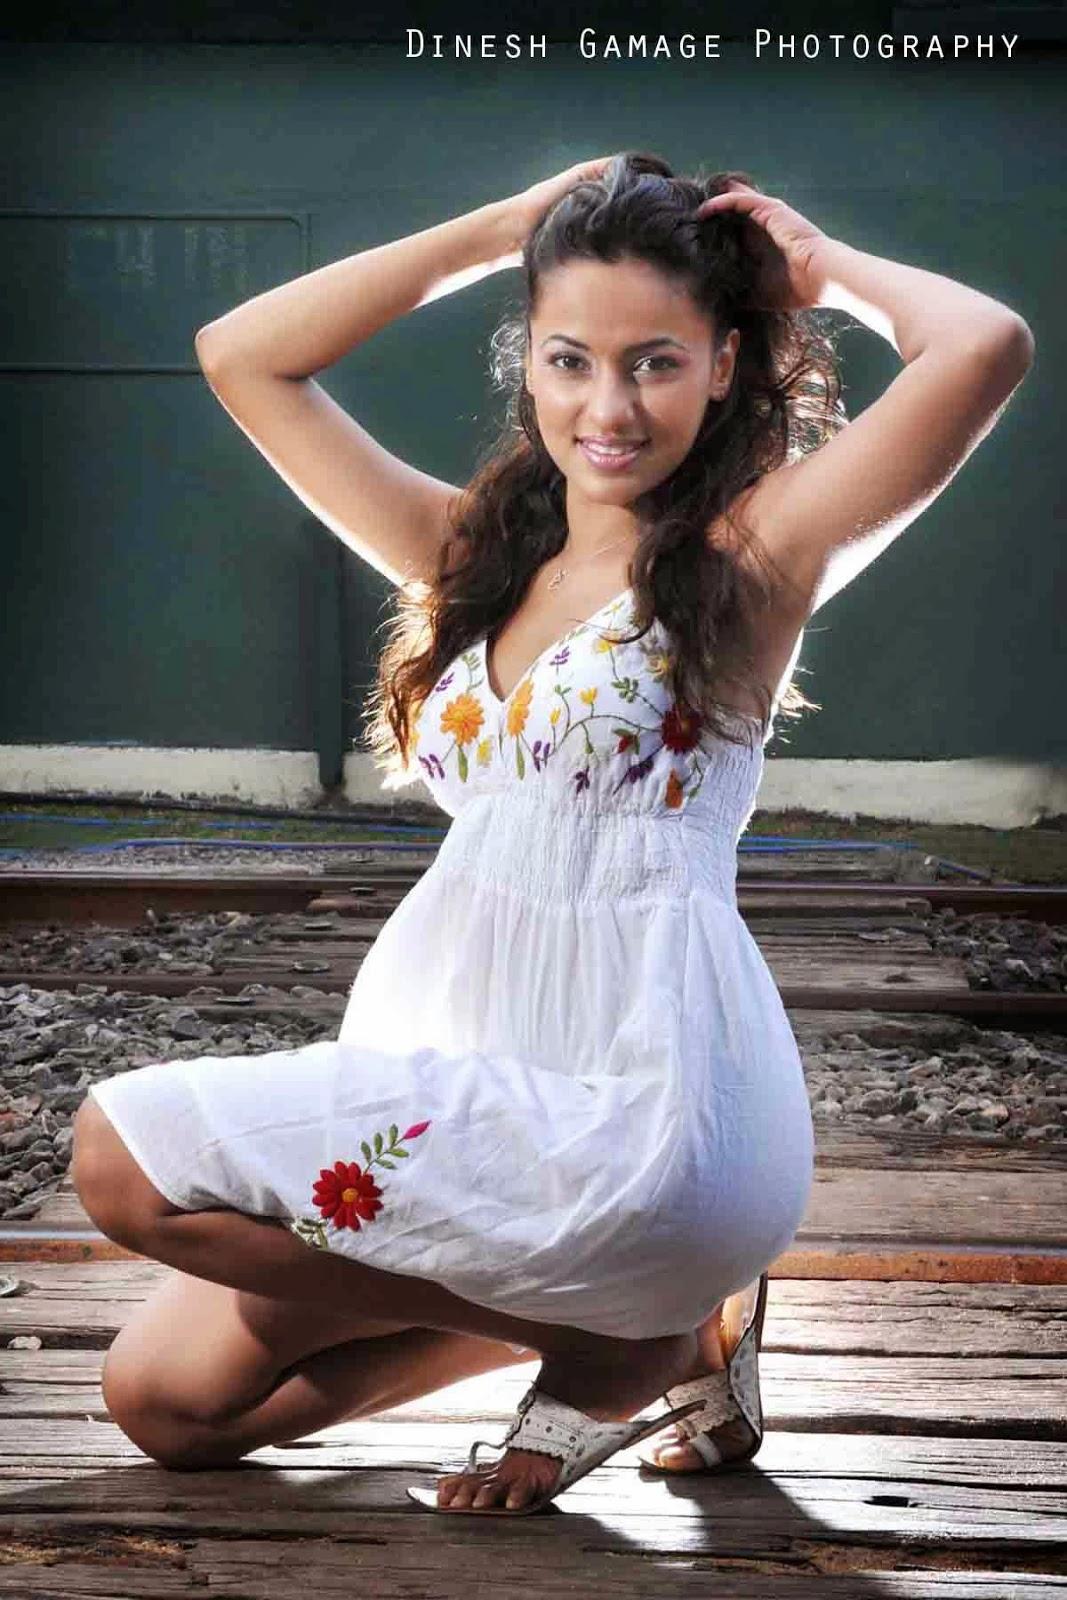 SL Hot Actress Pics: Udari by Dinesh - 283.9KB